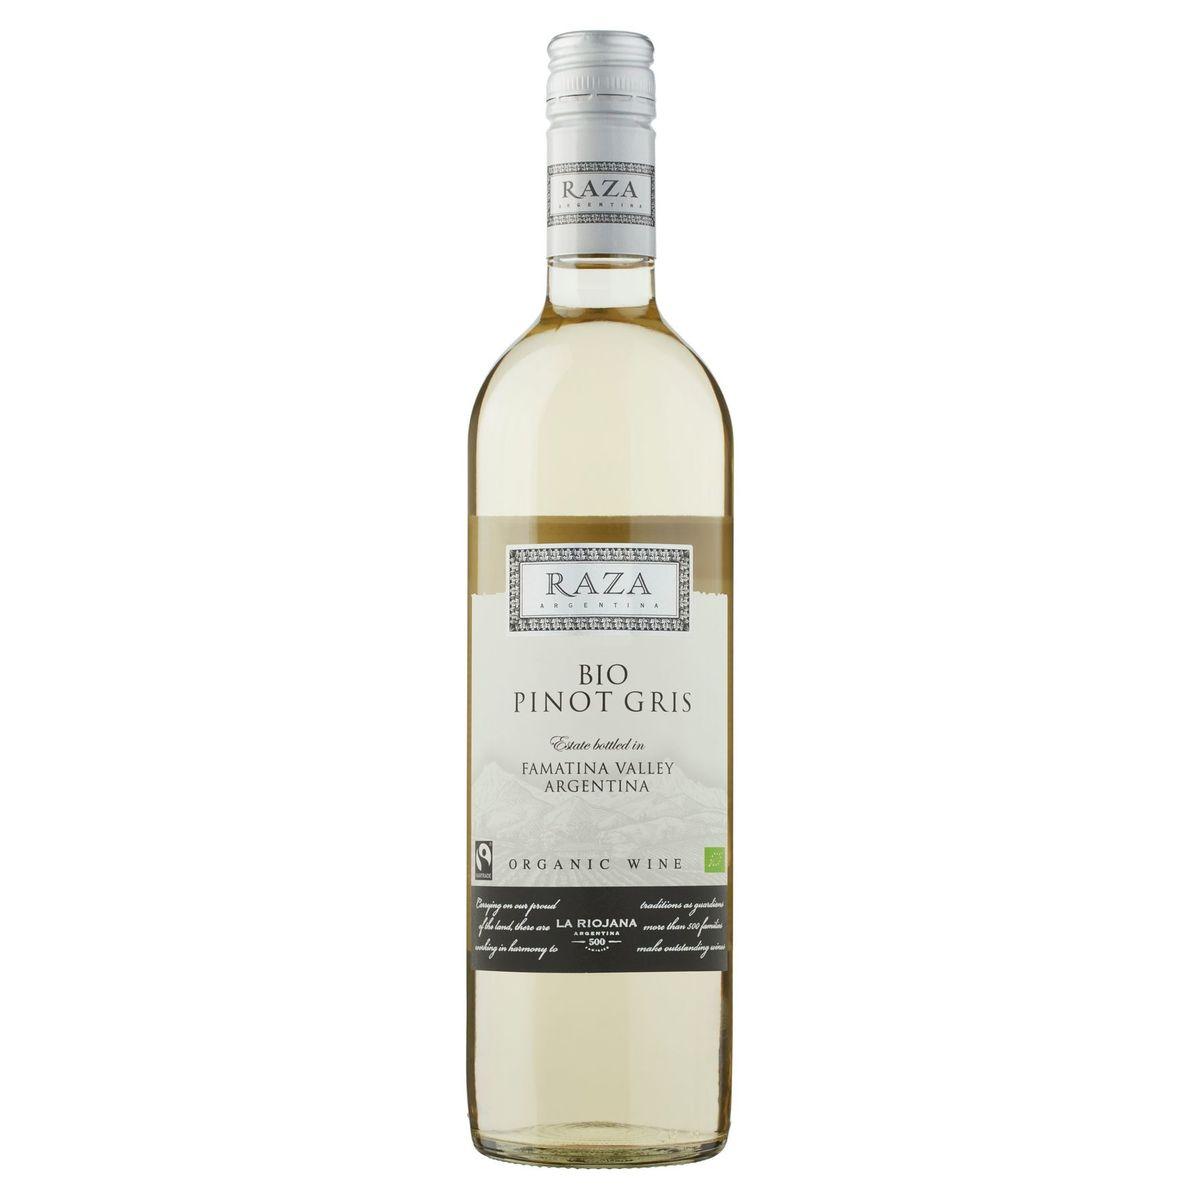 Argentinië La Riojana Raza Pinot Gris Bio